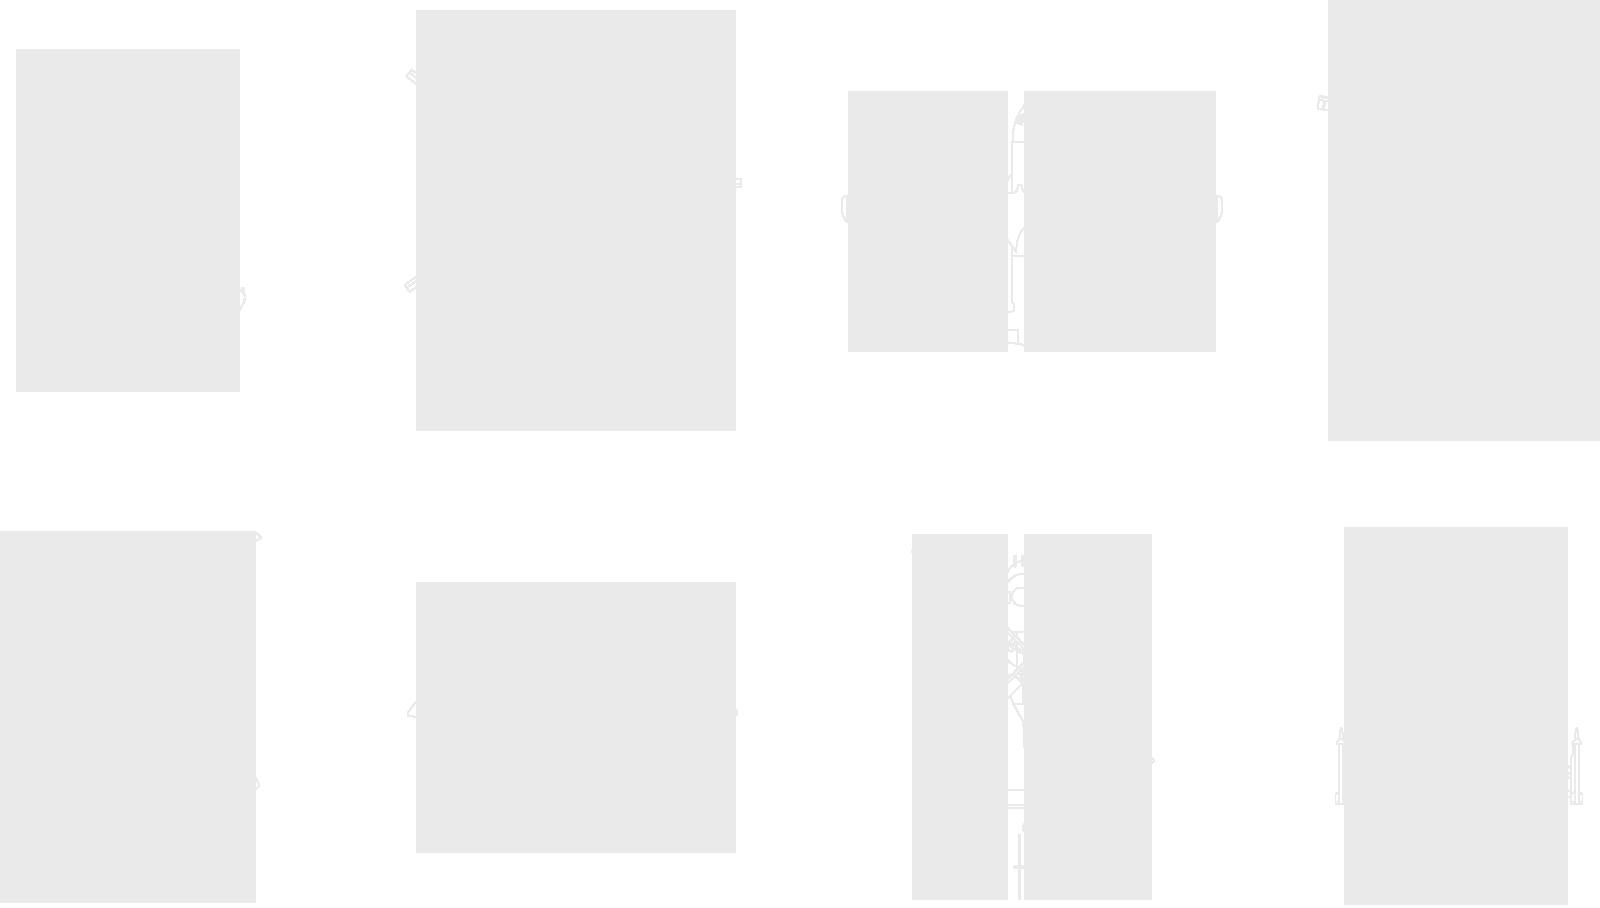 honeywellPlatforms